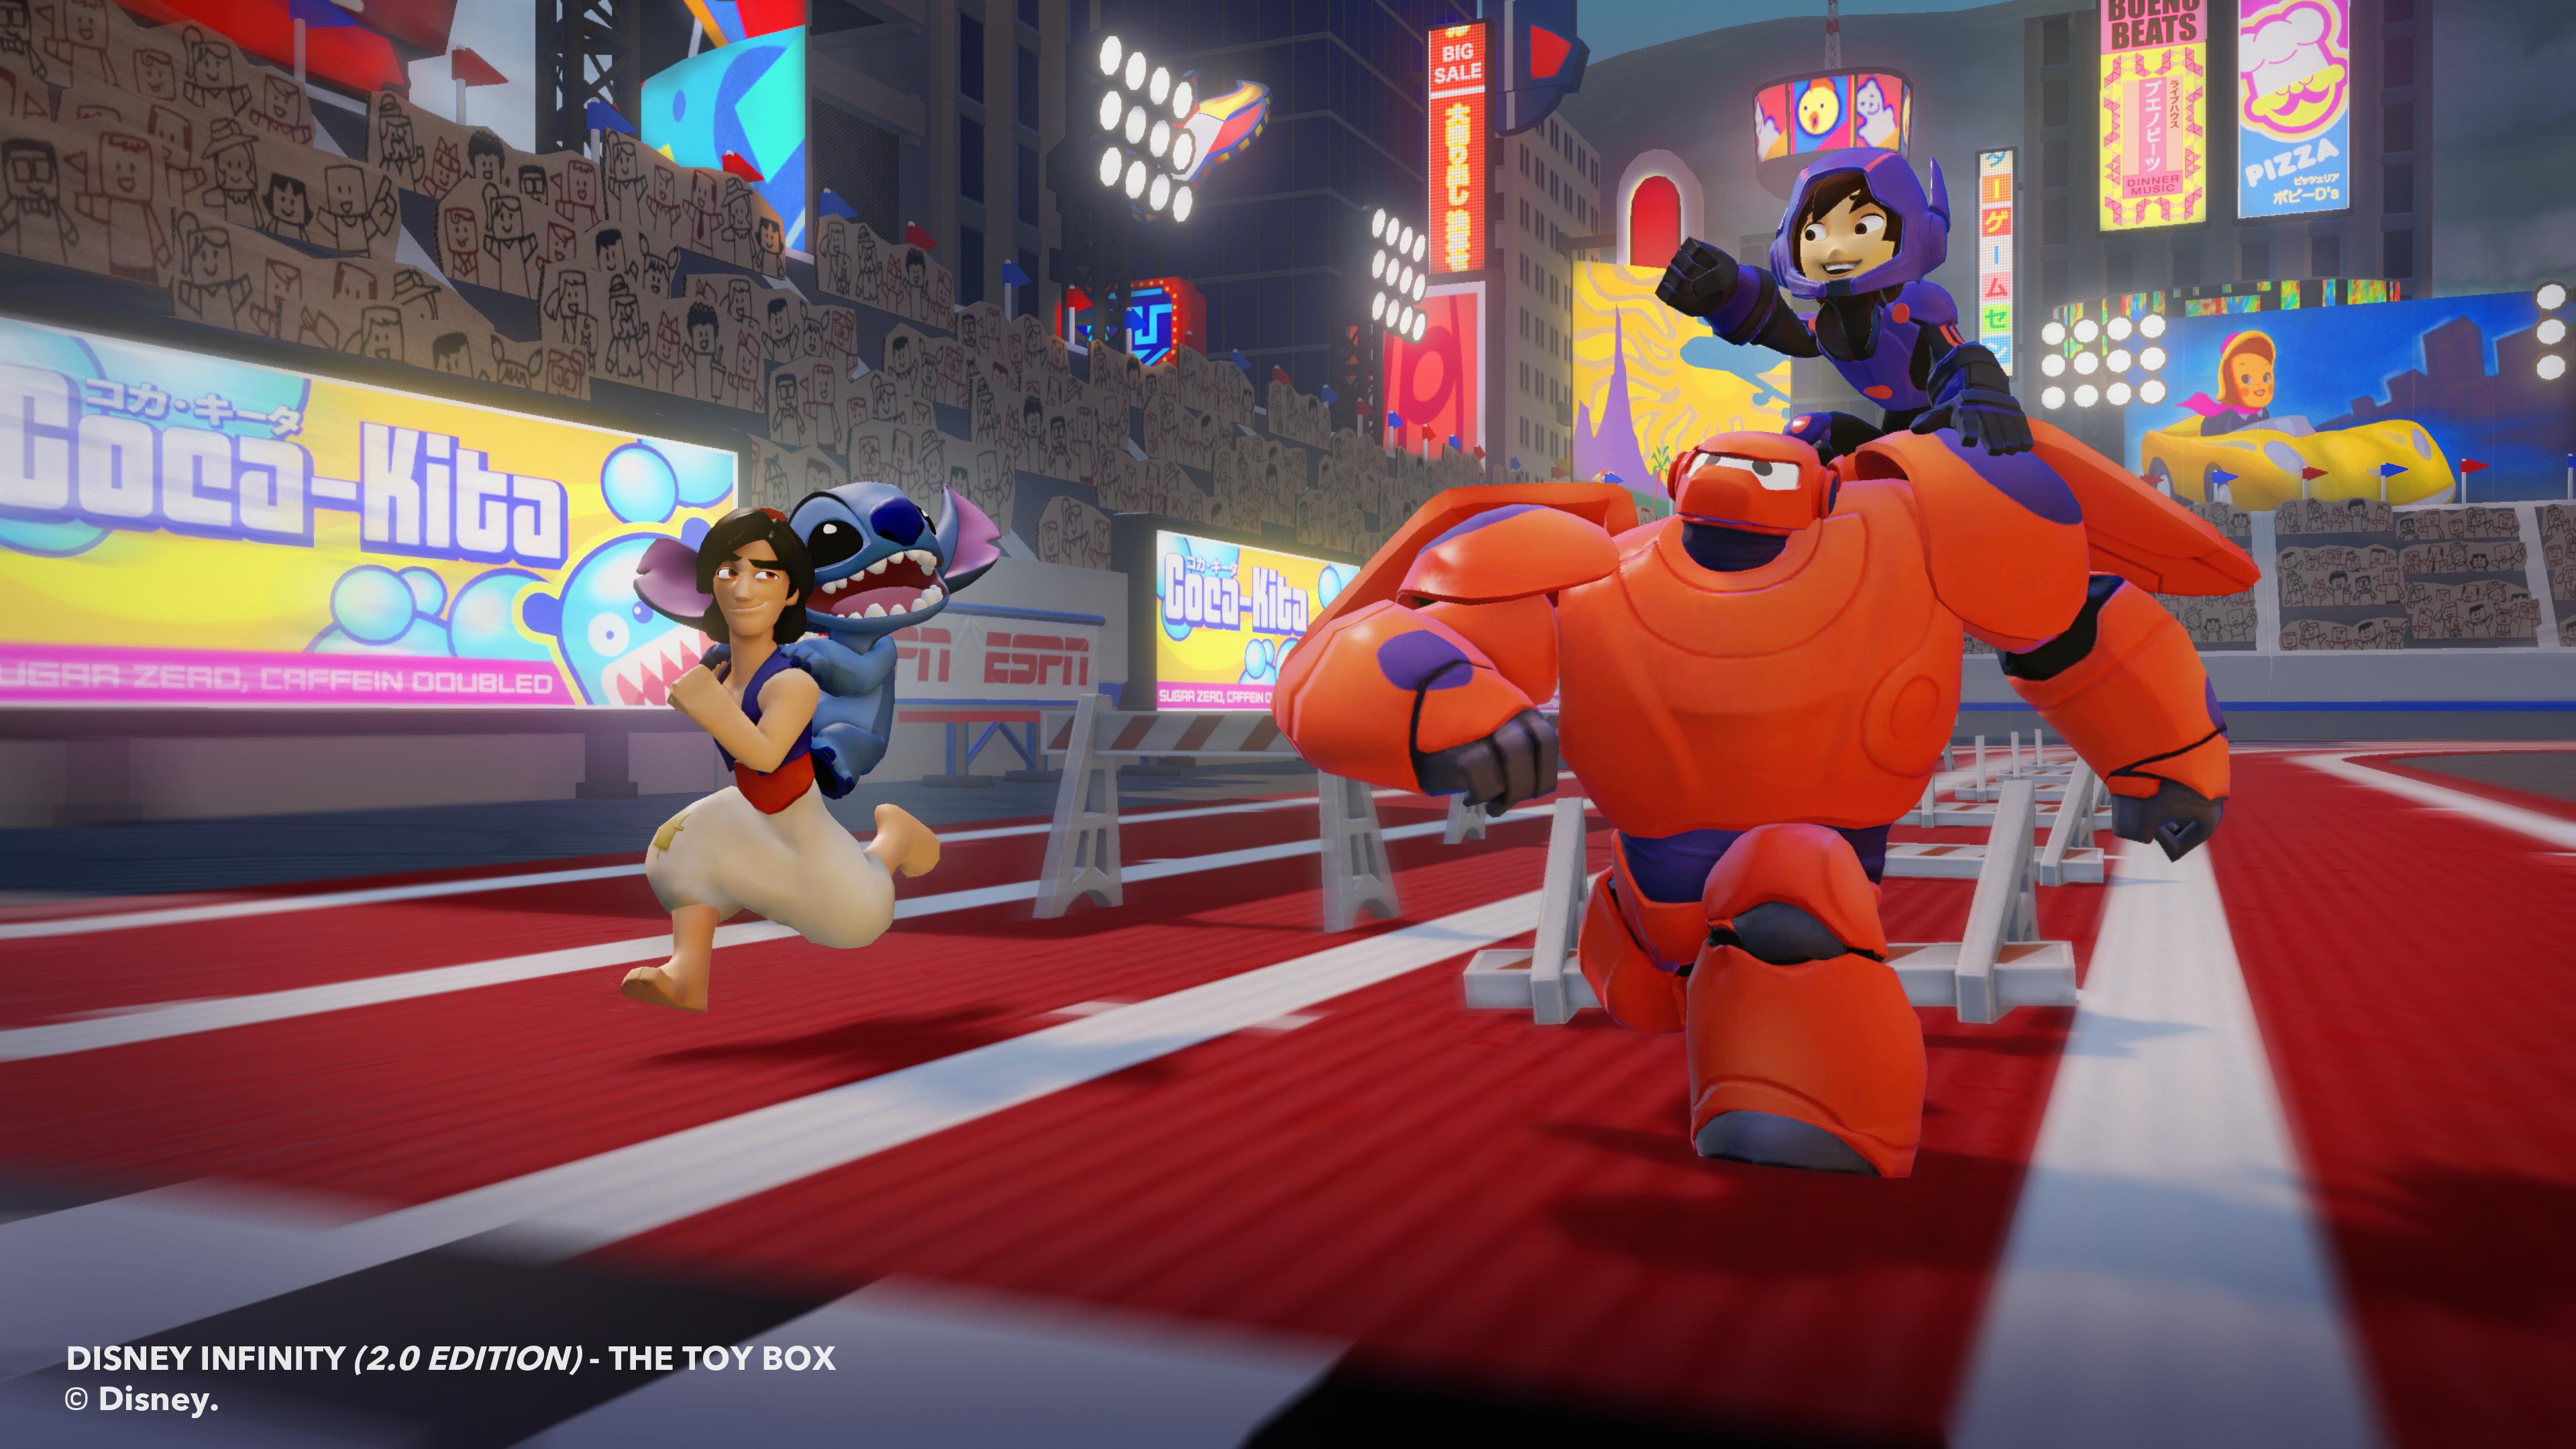 Big hero 6 disney infinity 2 0 toybox screenshots featuring hiro and